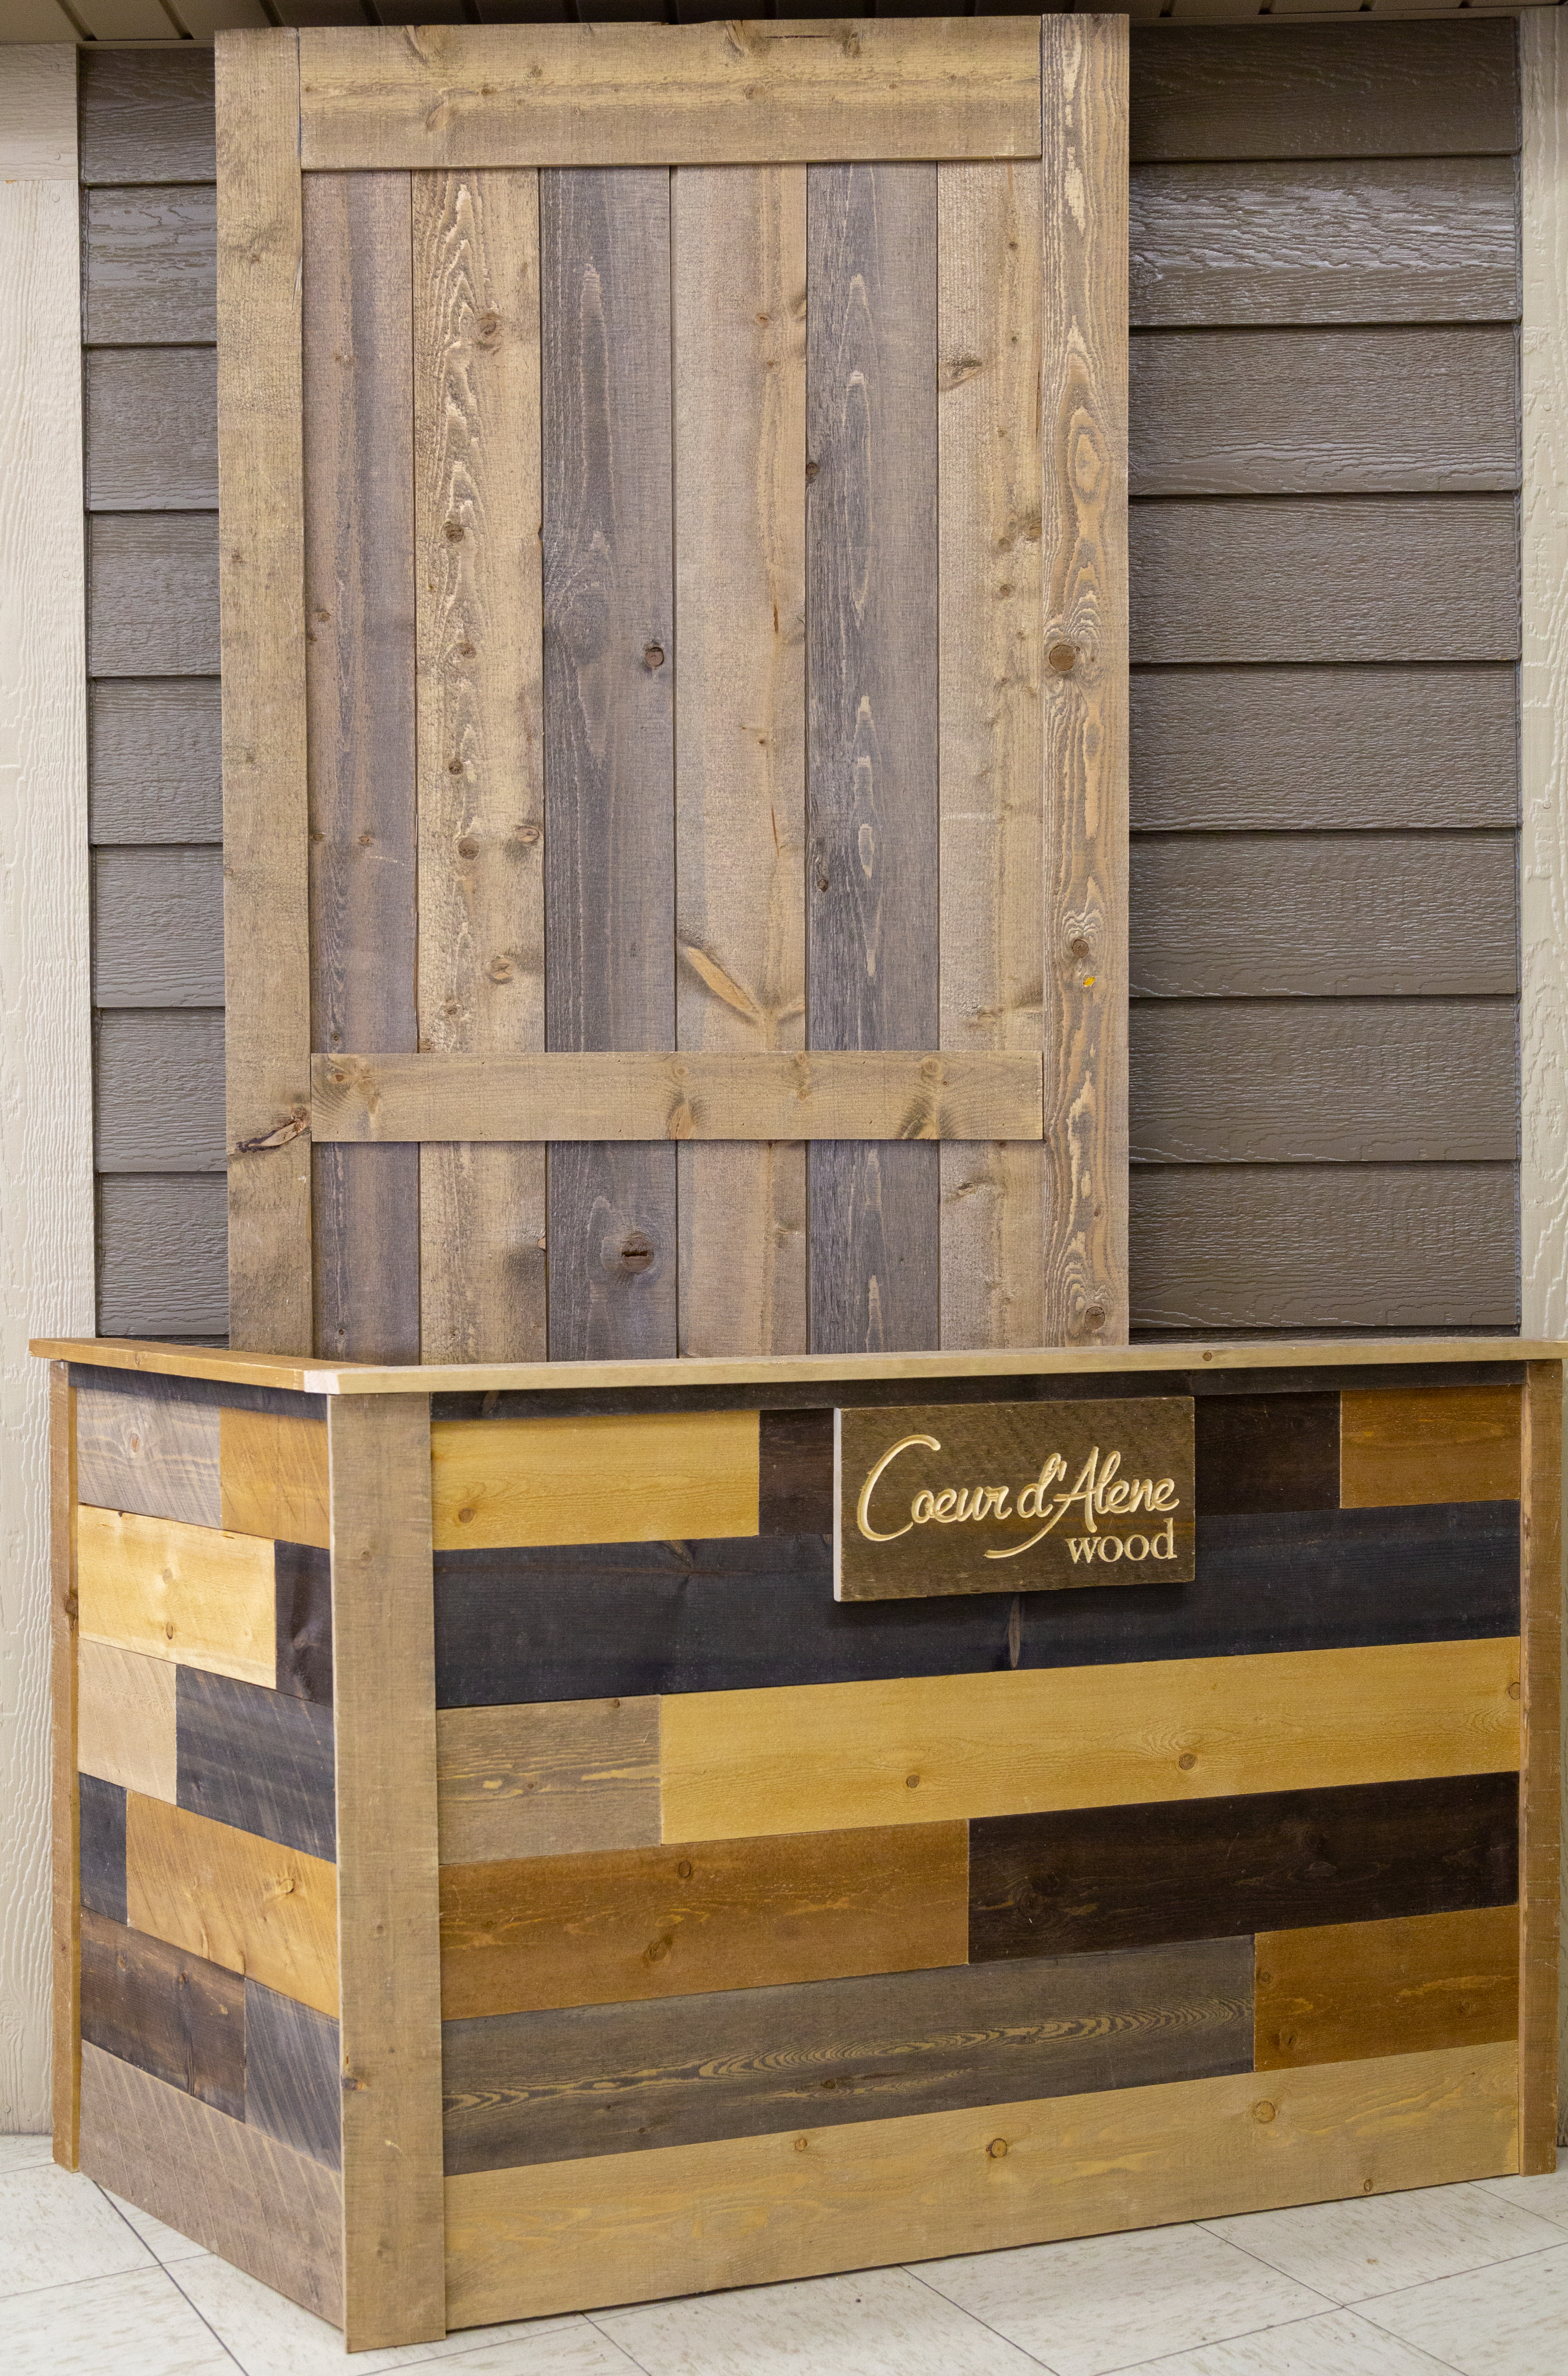 CDA Wood display at Suburban Lumber